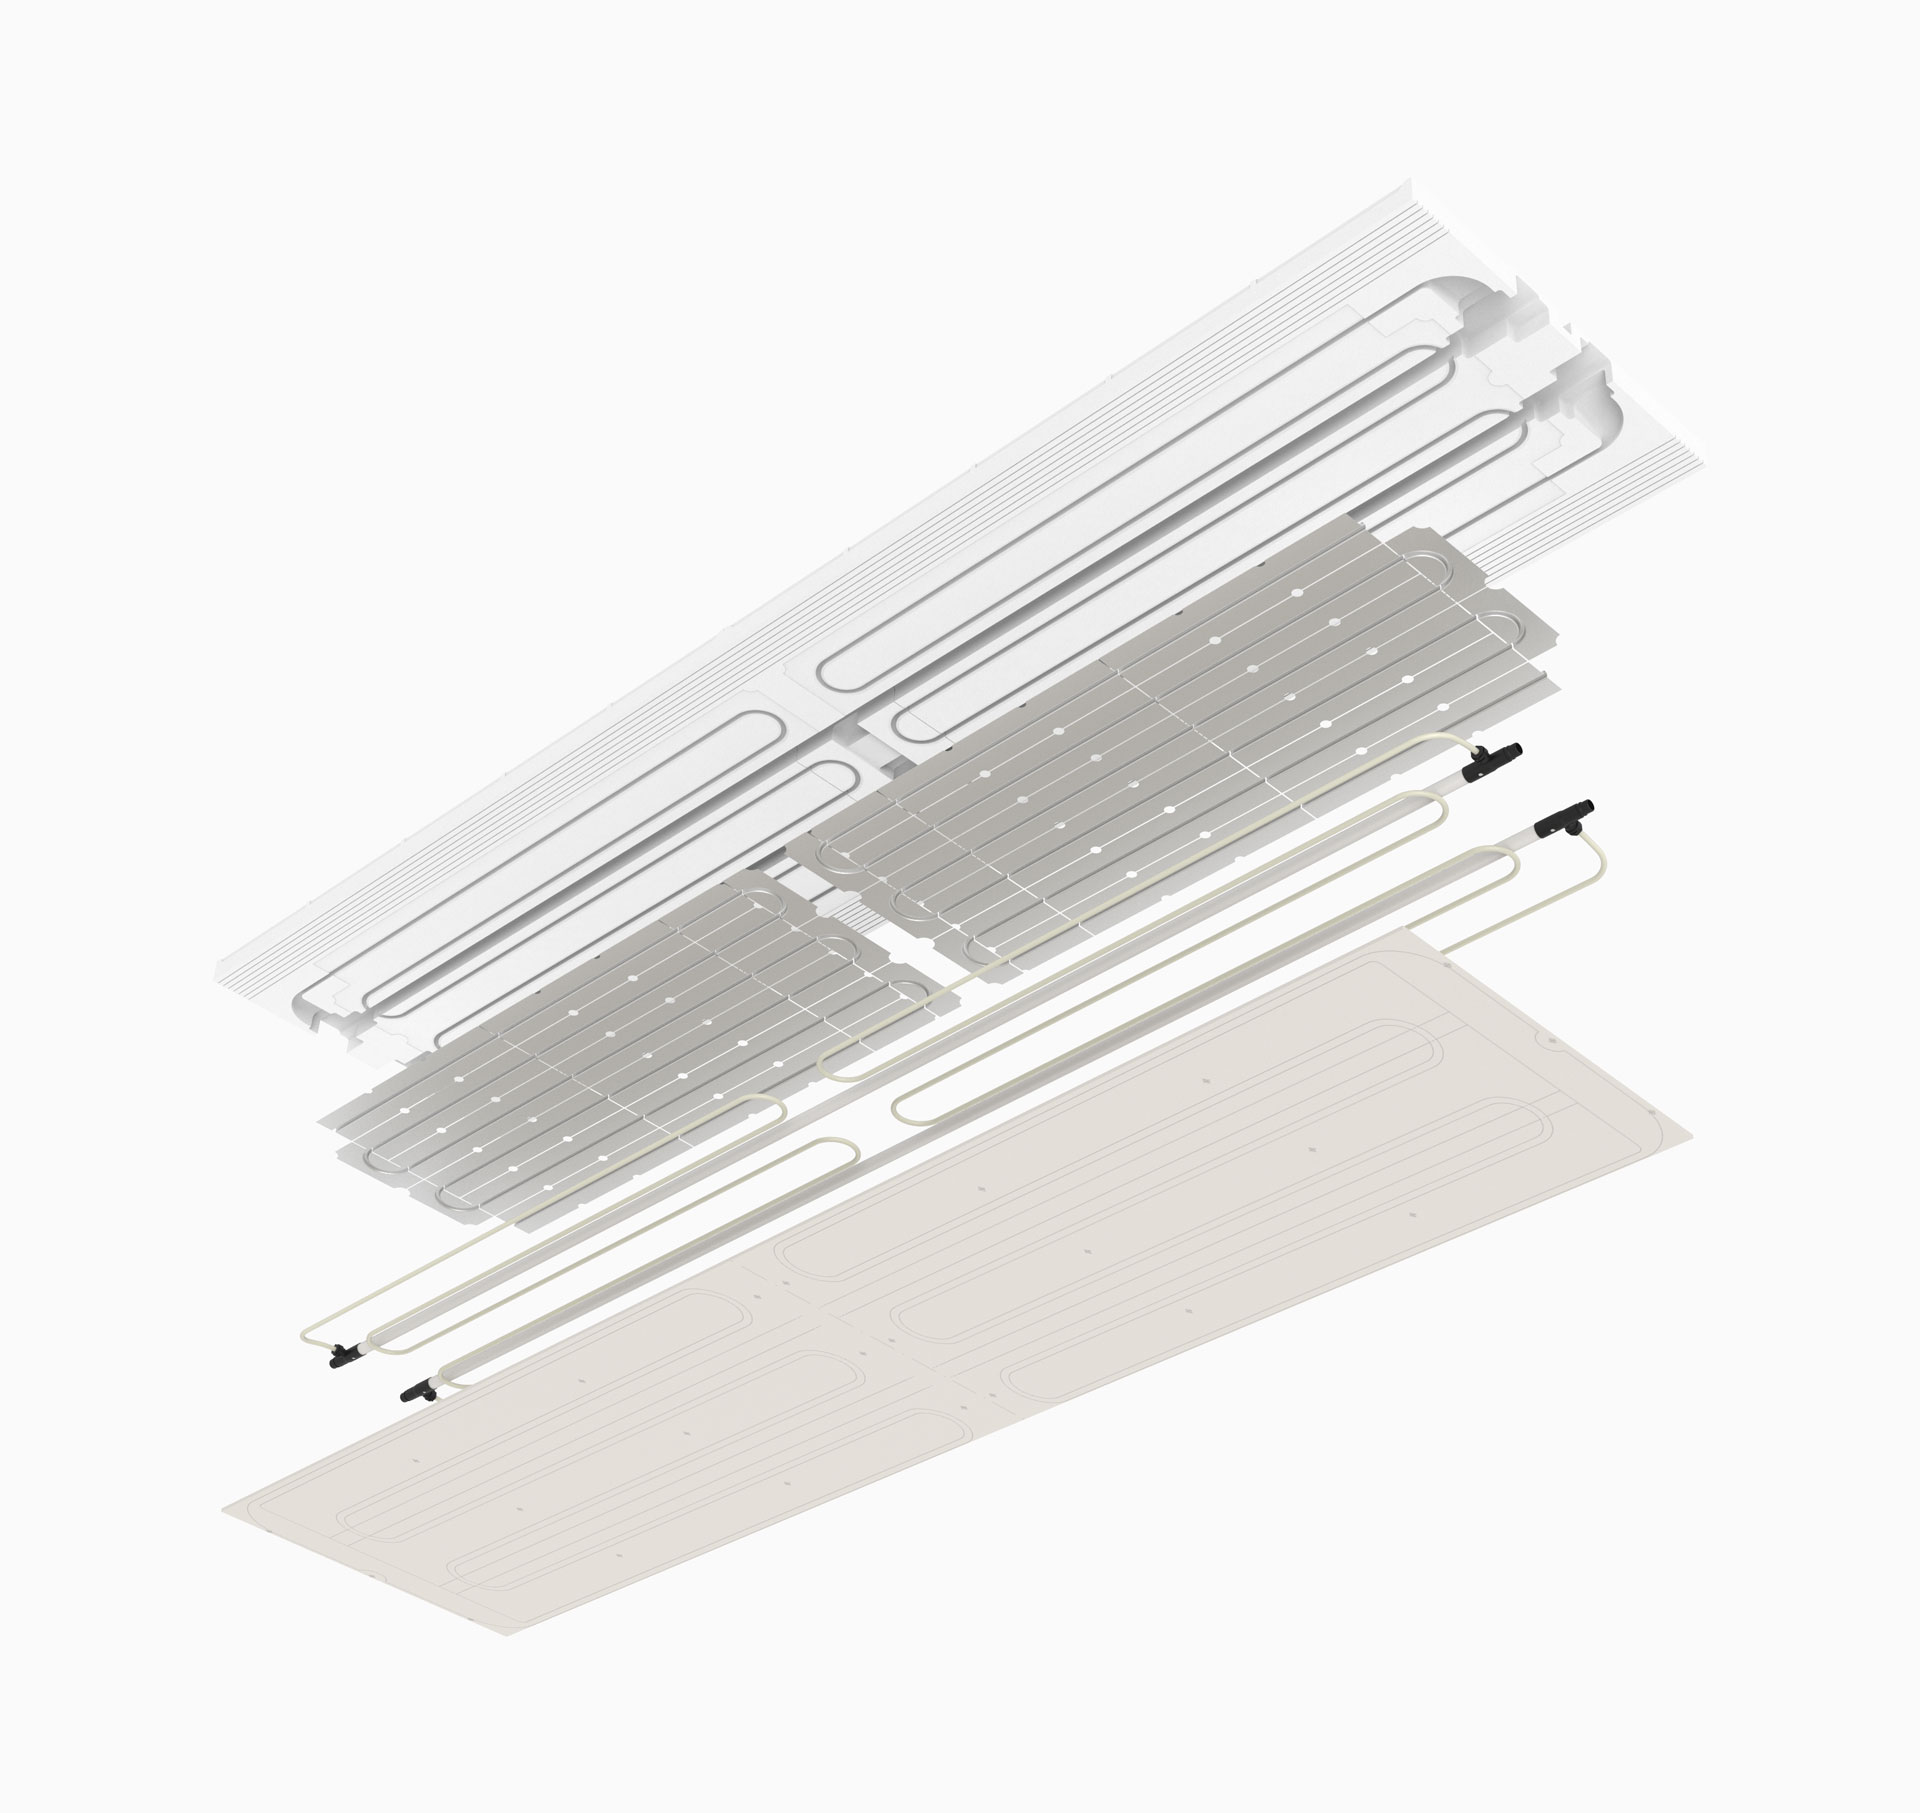 prefabricated radiant panel UTbeams - pannello radiante prefabbricato UTbeams